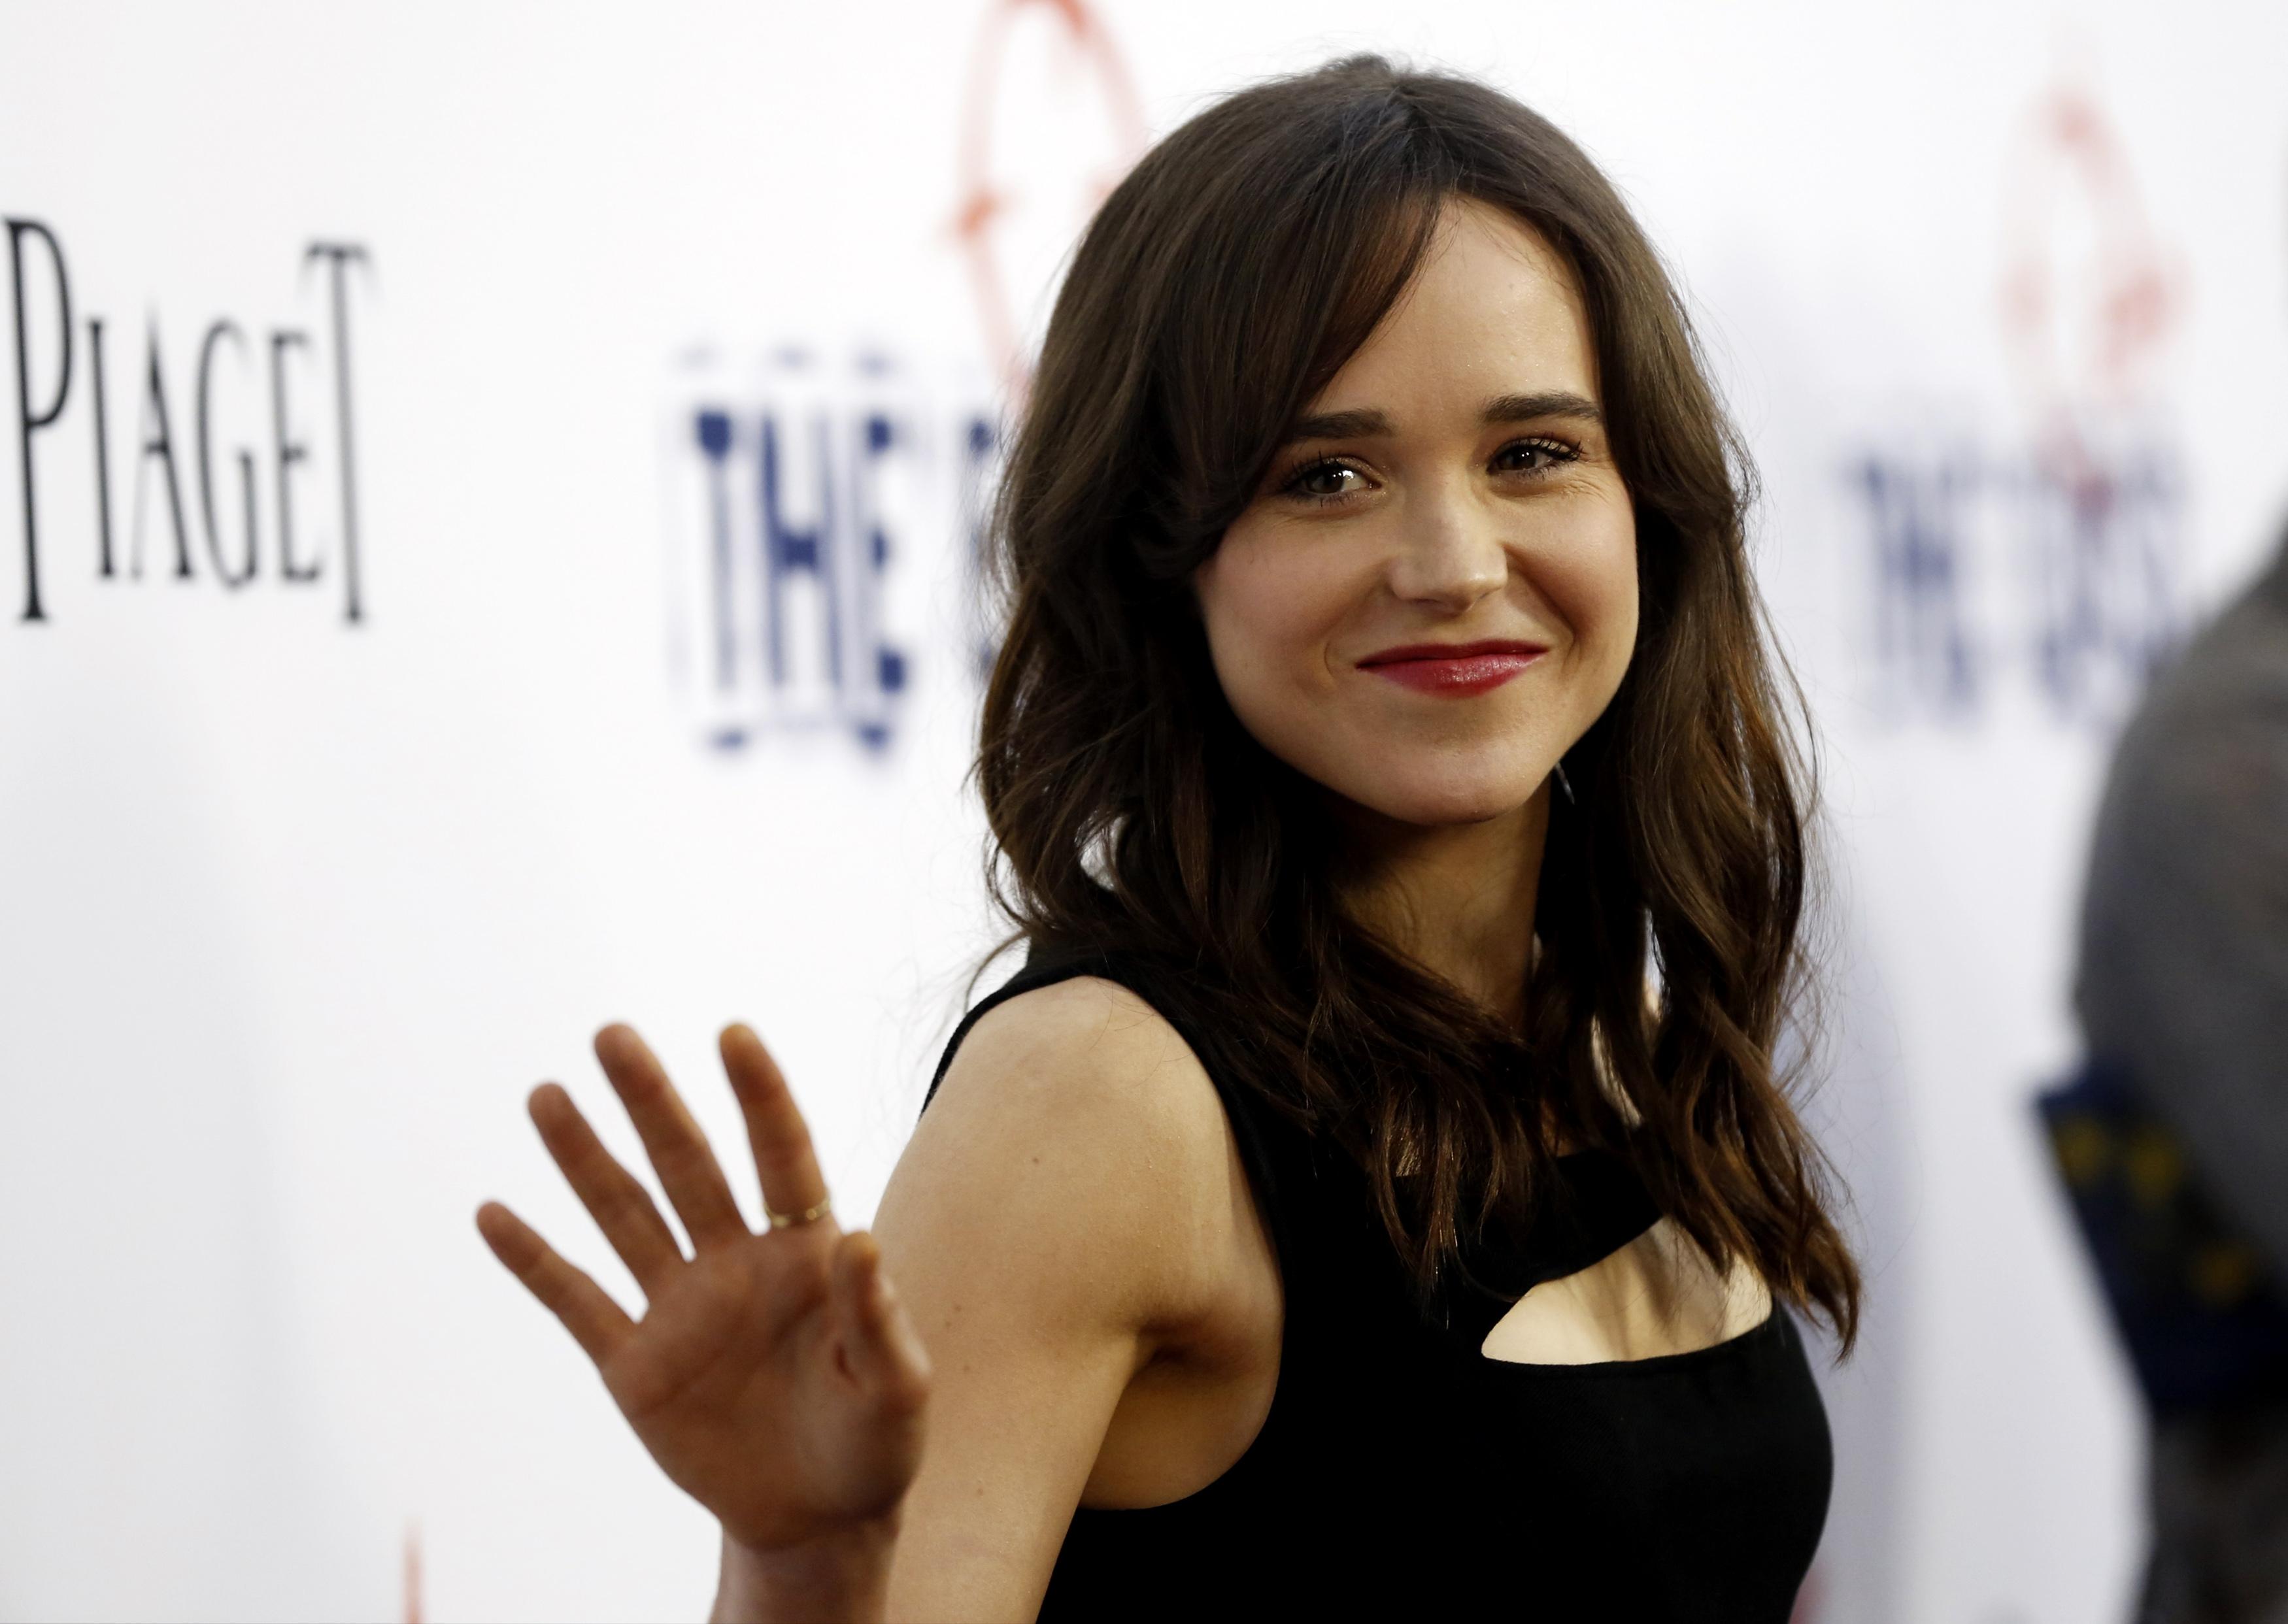 Ellen Page - posted in the gentlemanboners community